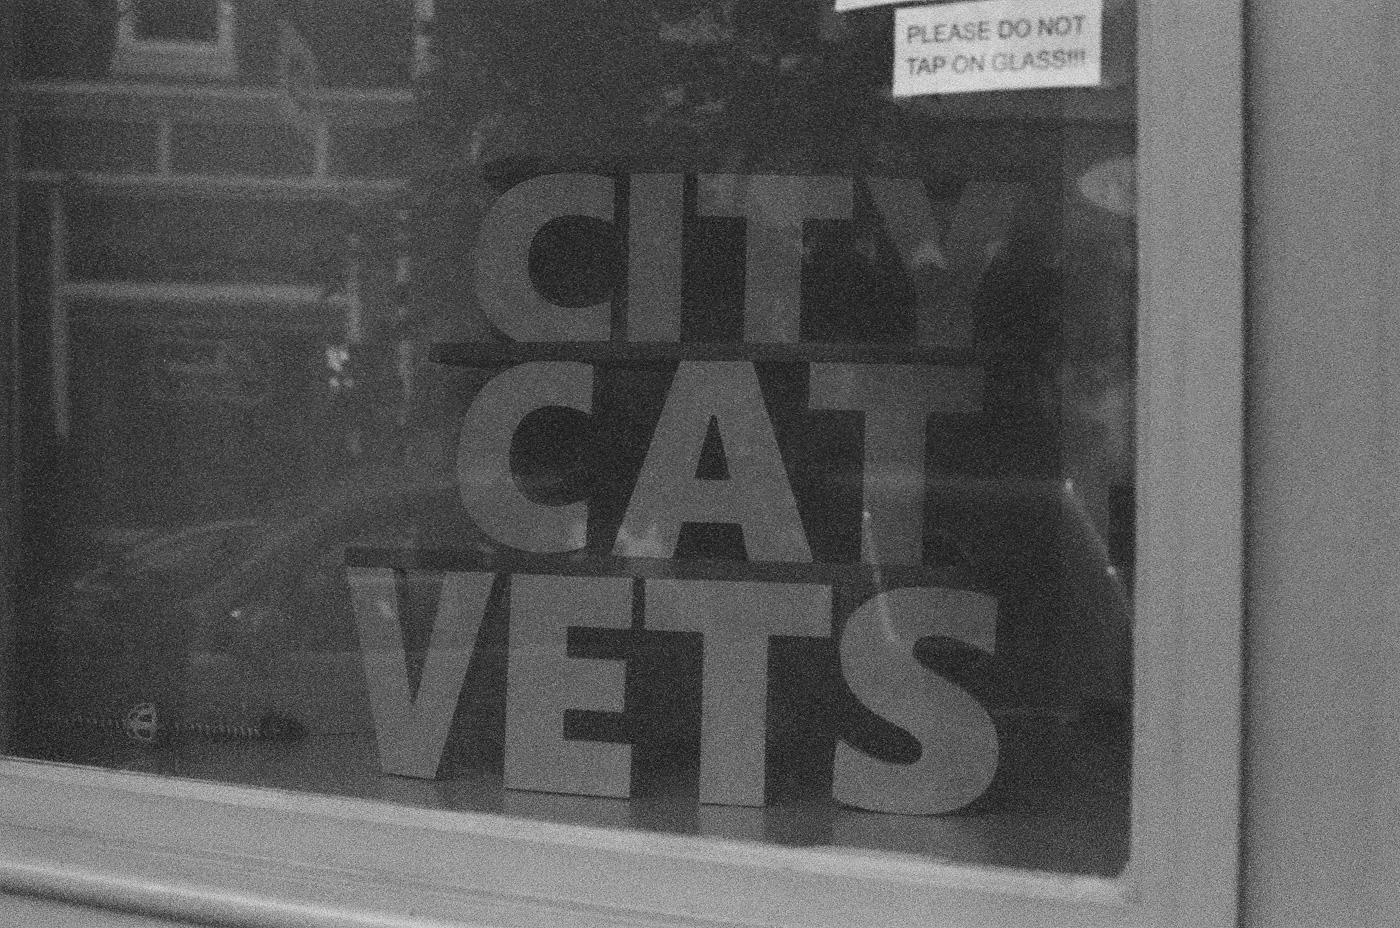 CITY CAT VETS